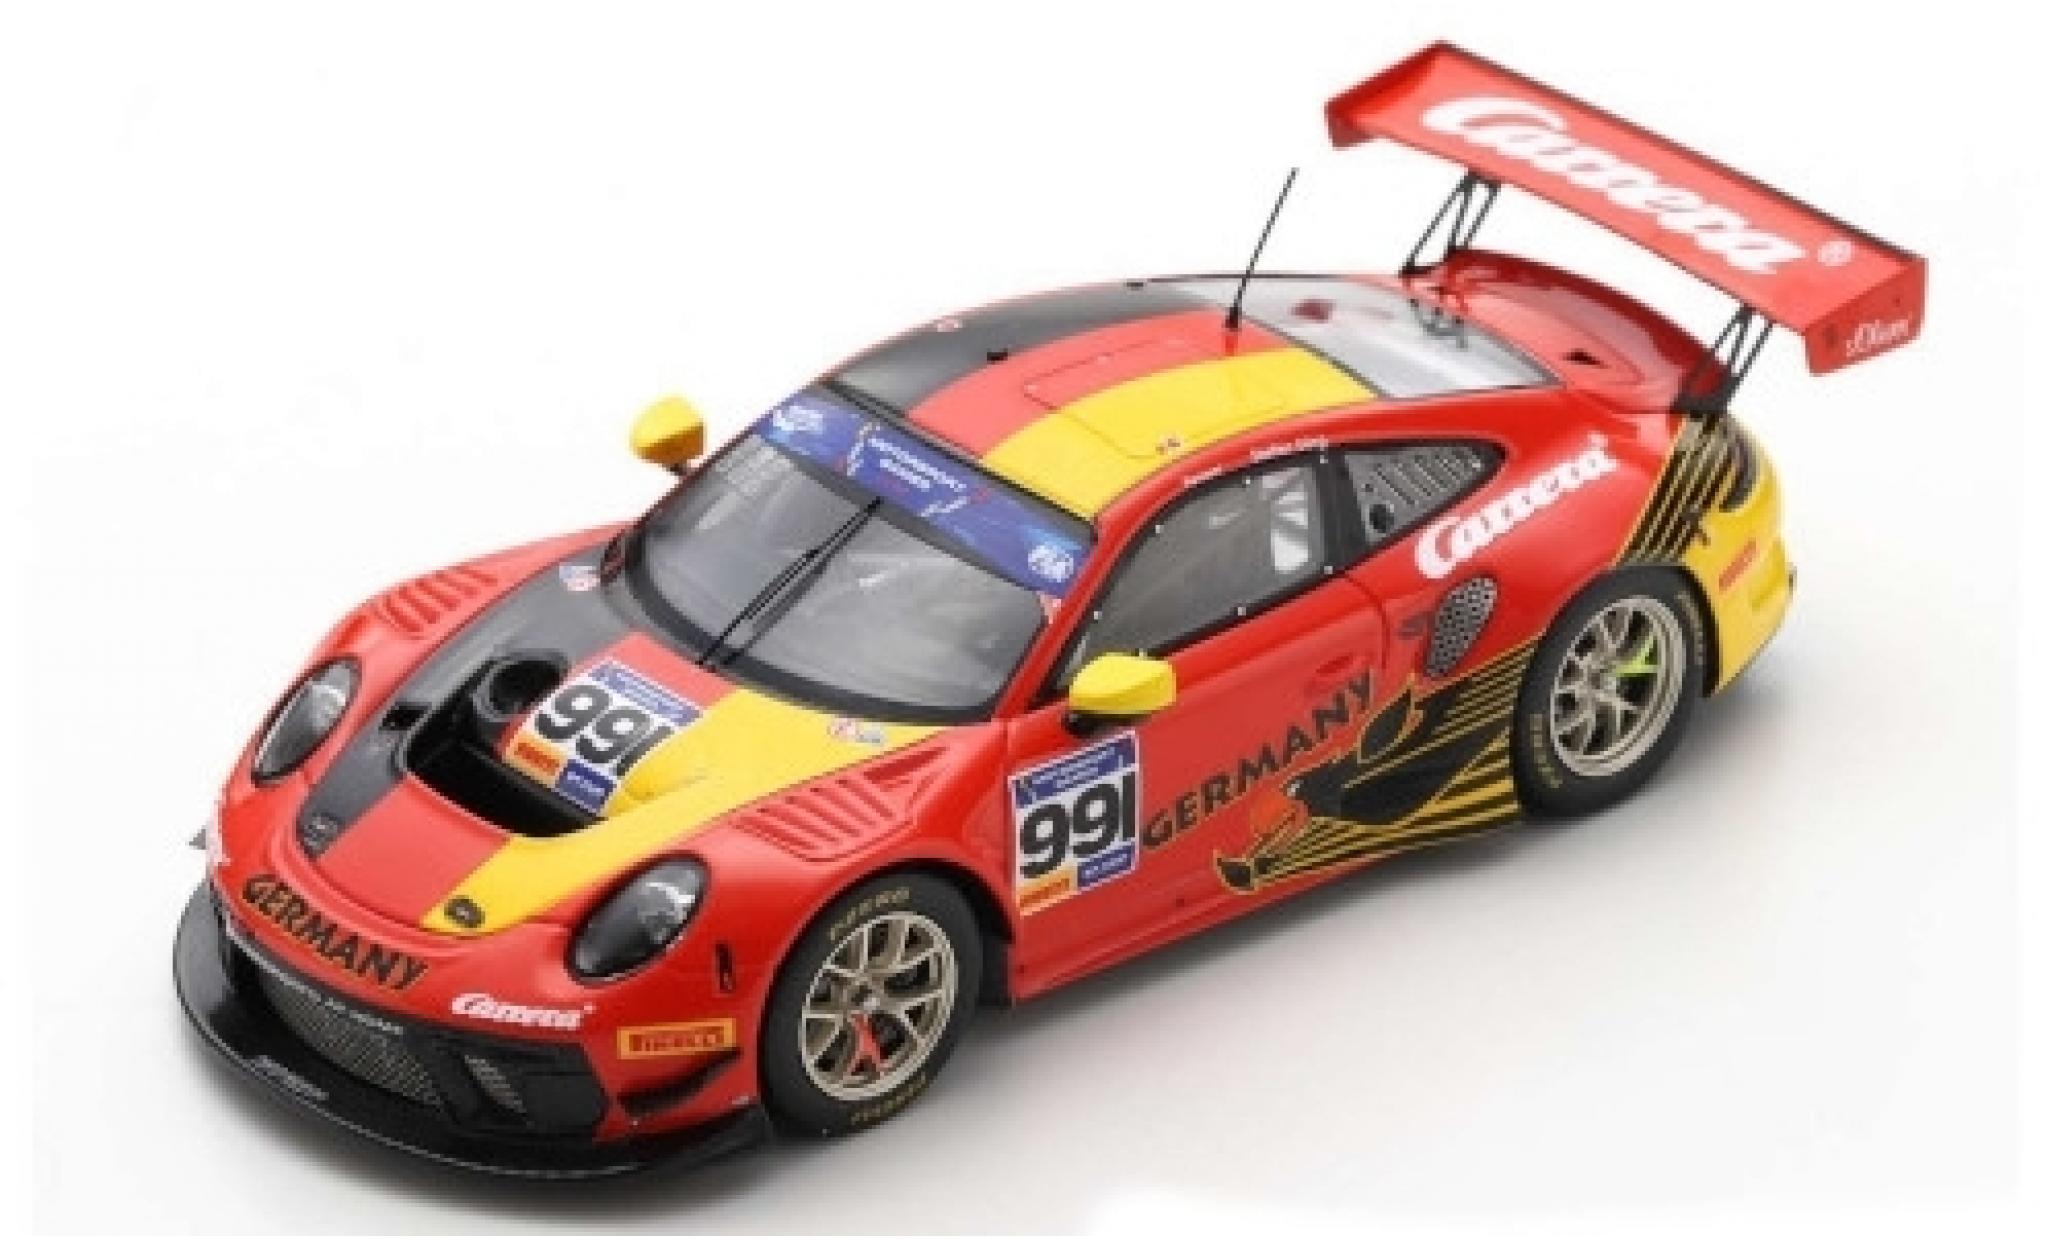 Porsche 992 GT3 R 1/43 Spark 911 No.991 Team Germany FIA Motorsport Games GT Cup Vallelunga 2019 S.Görig/A.Renauer